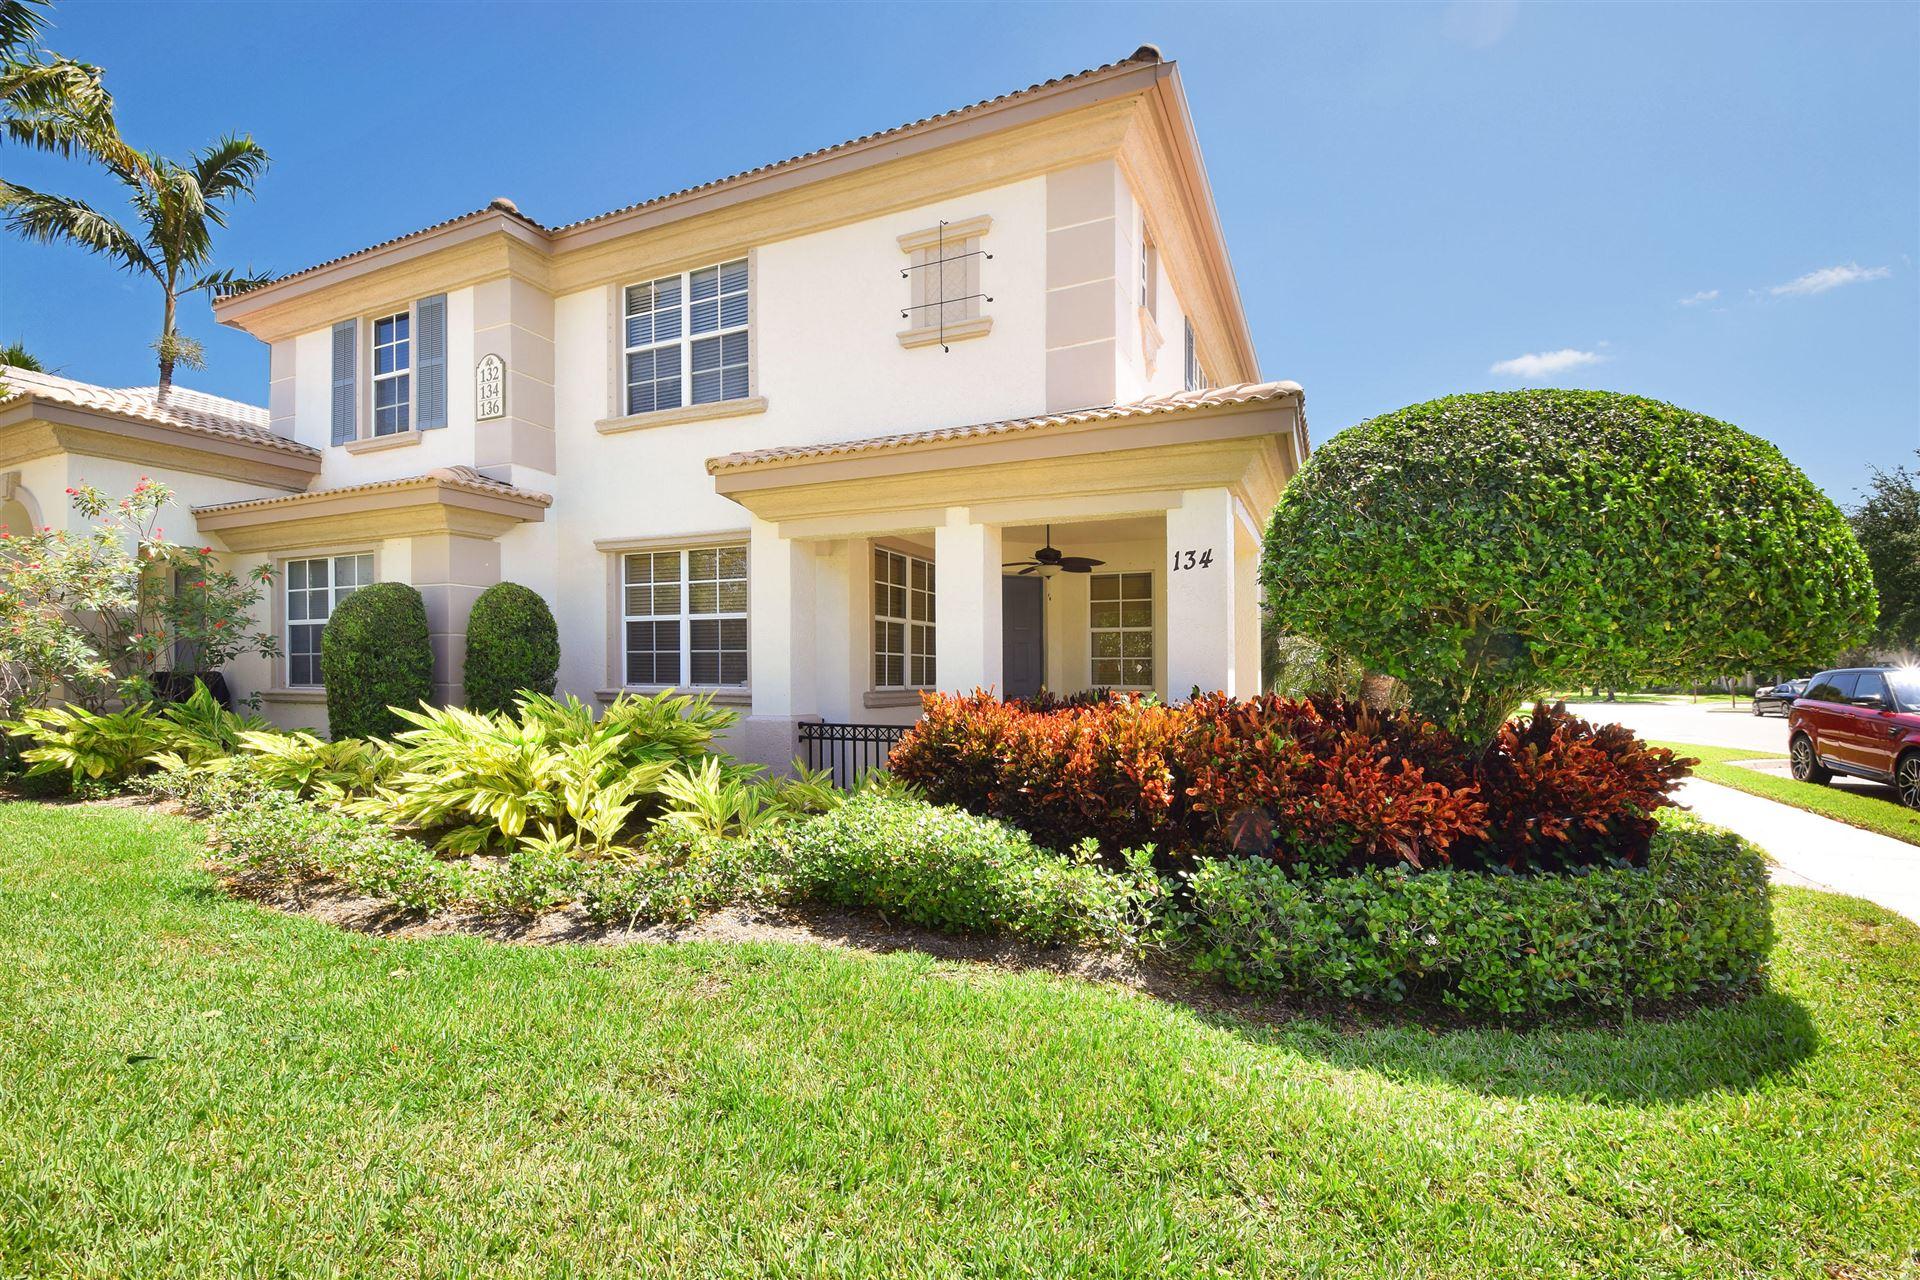 Photo of 134 Evergrene Parkway, Palm Beach Gardens, FL 33410 (MLS # RX-10627056)